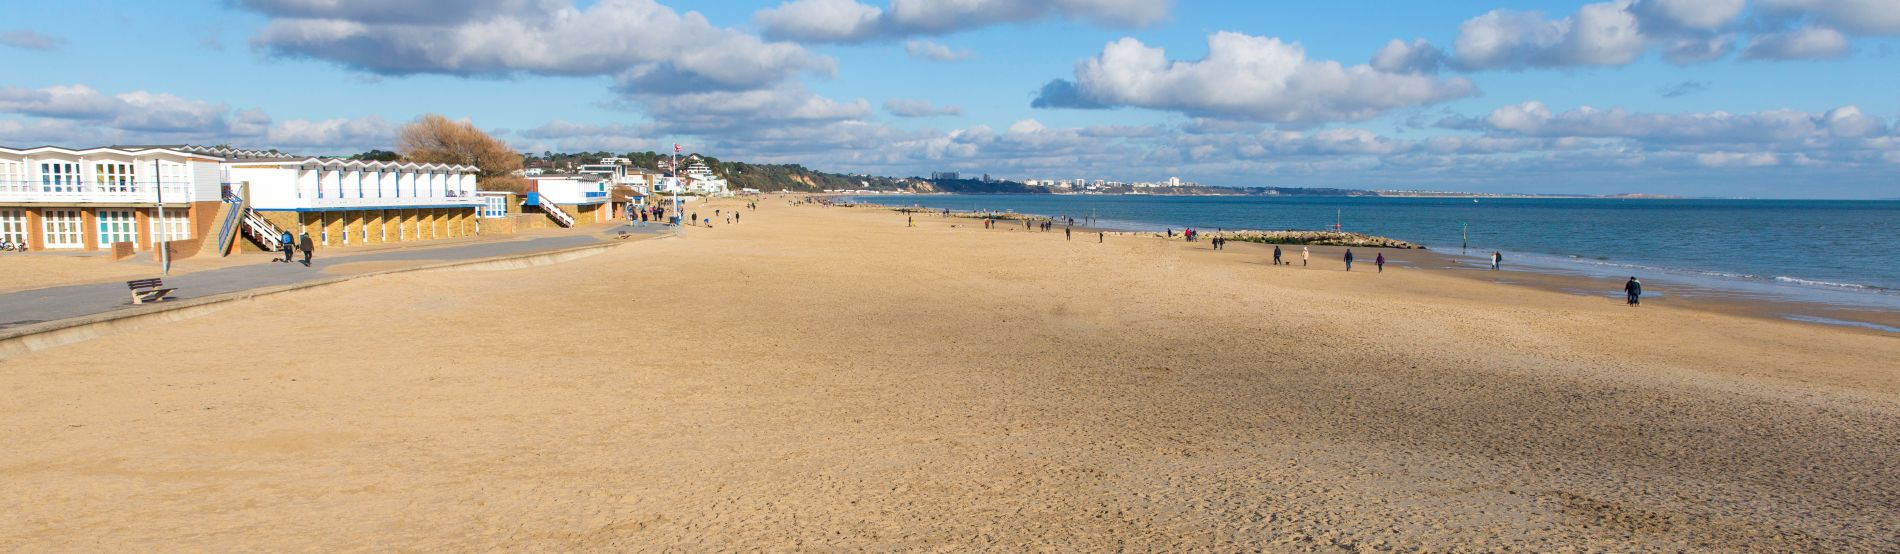 Sandbanks beach and waves Poole Dorset England UK stock photo